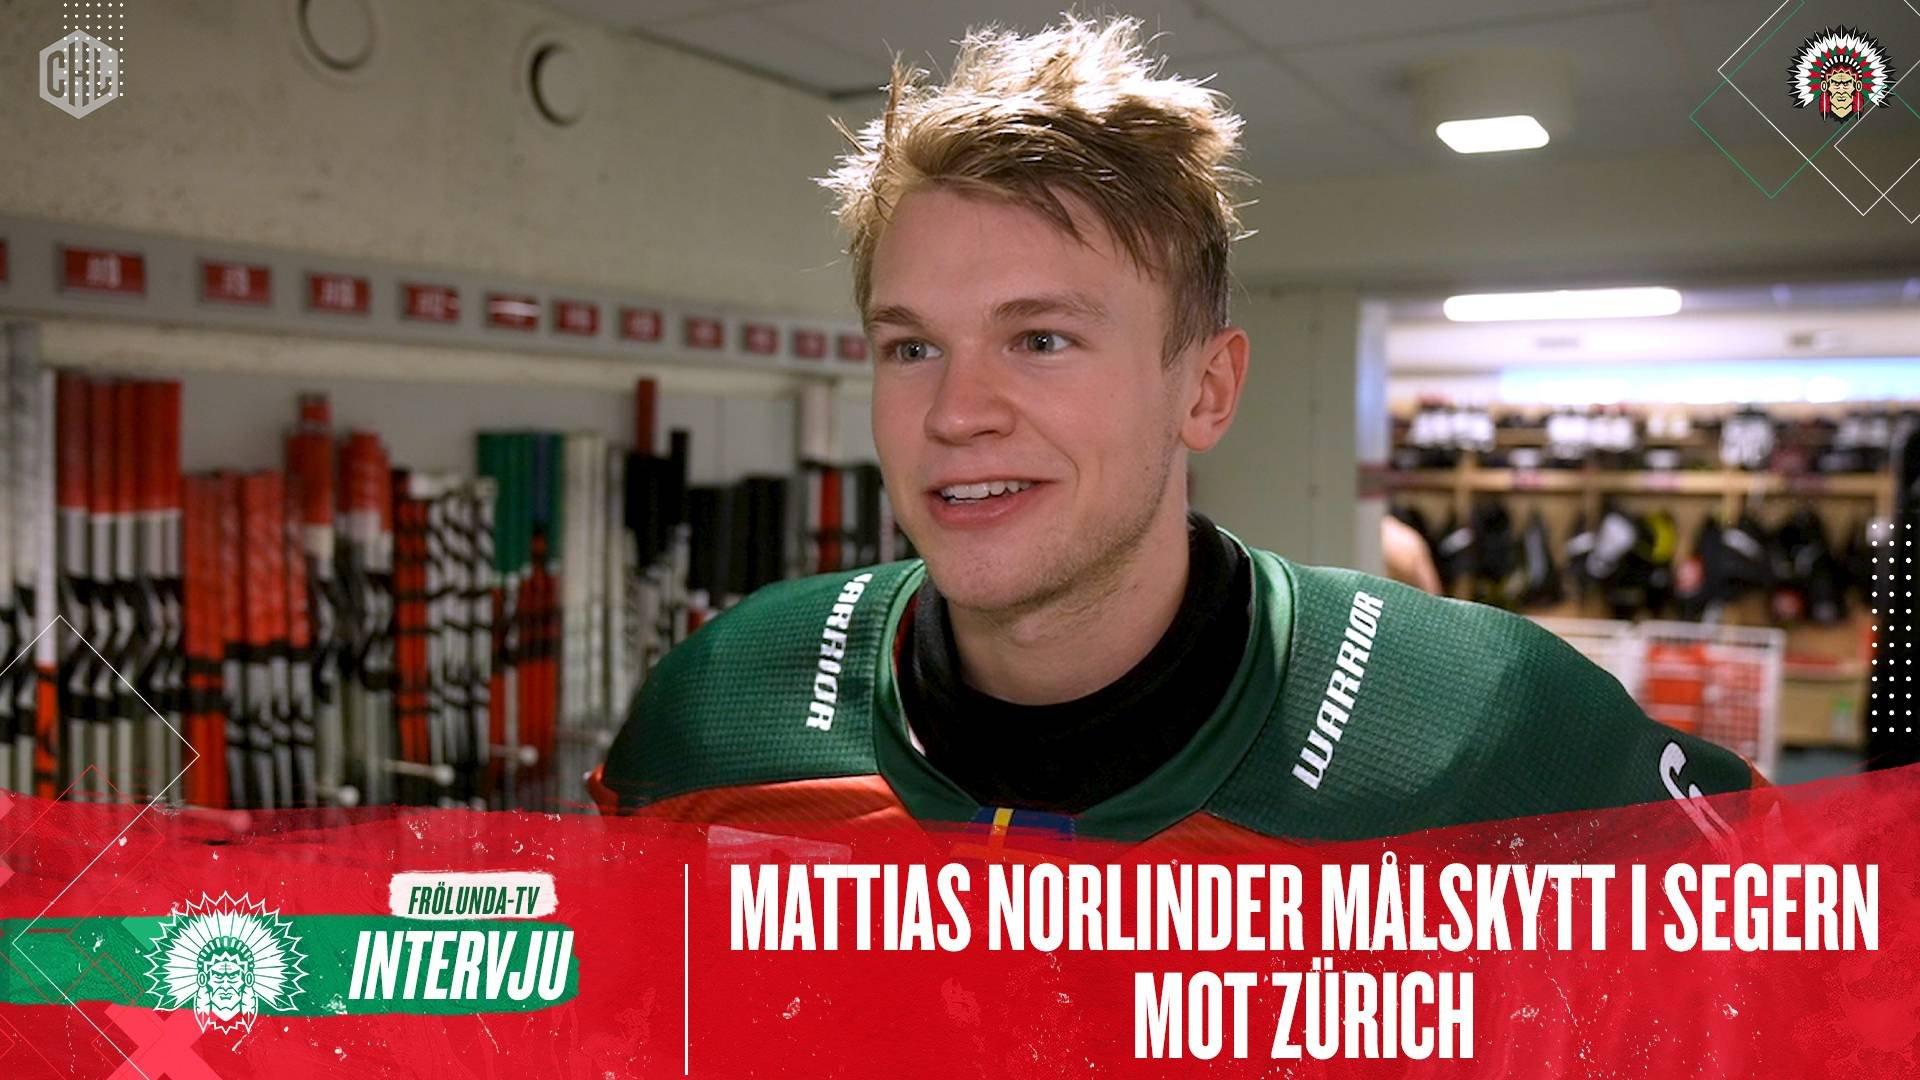 Mattias Norlinder efter Zürich